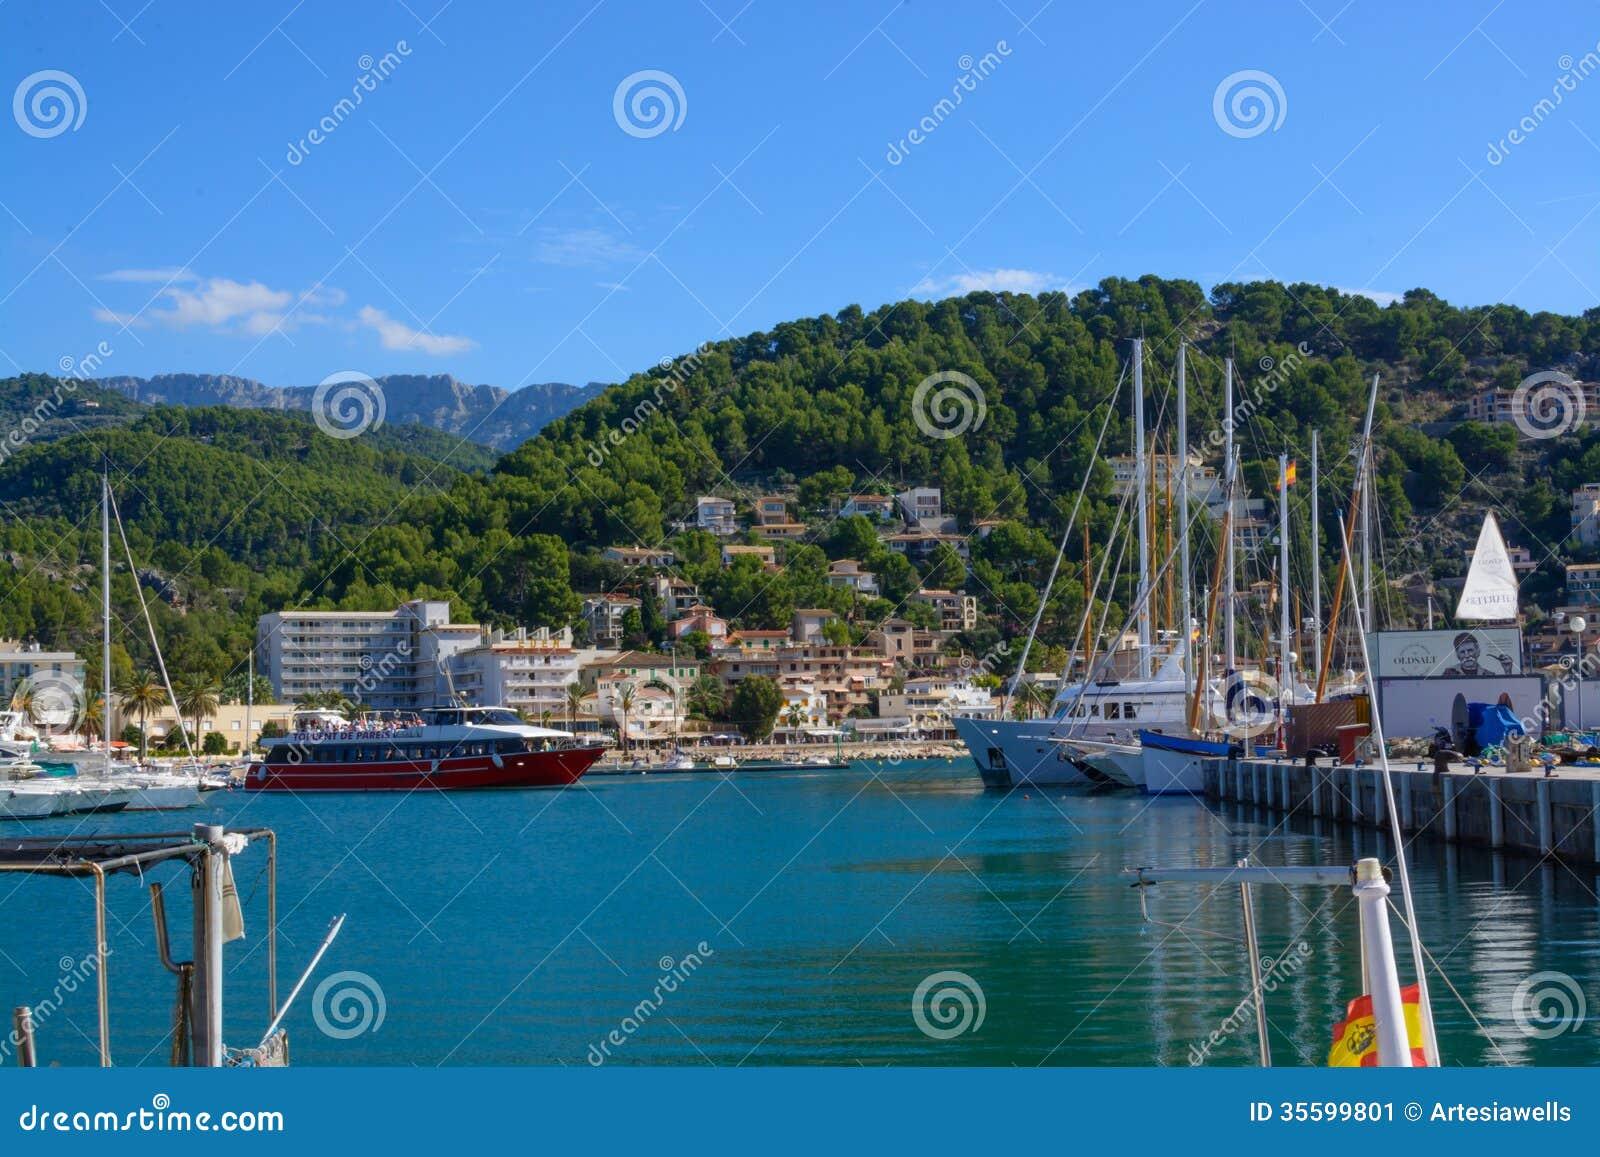 punta-del-este-beach-uruguay-marina-boats-44023122.jpg